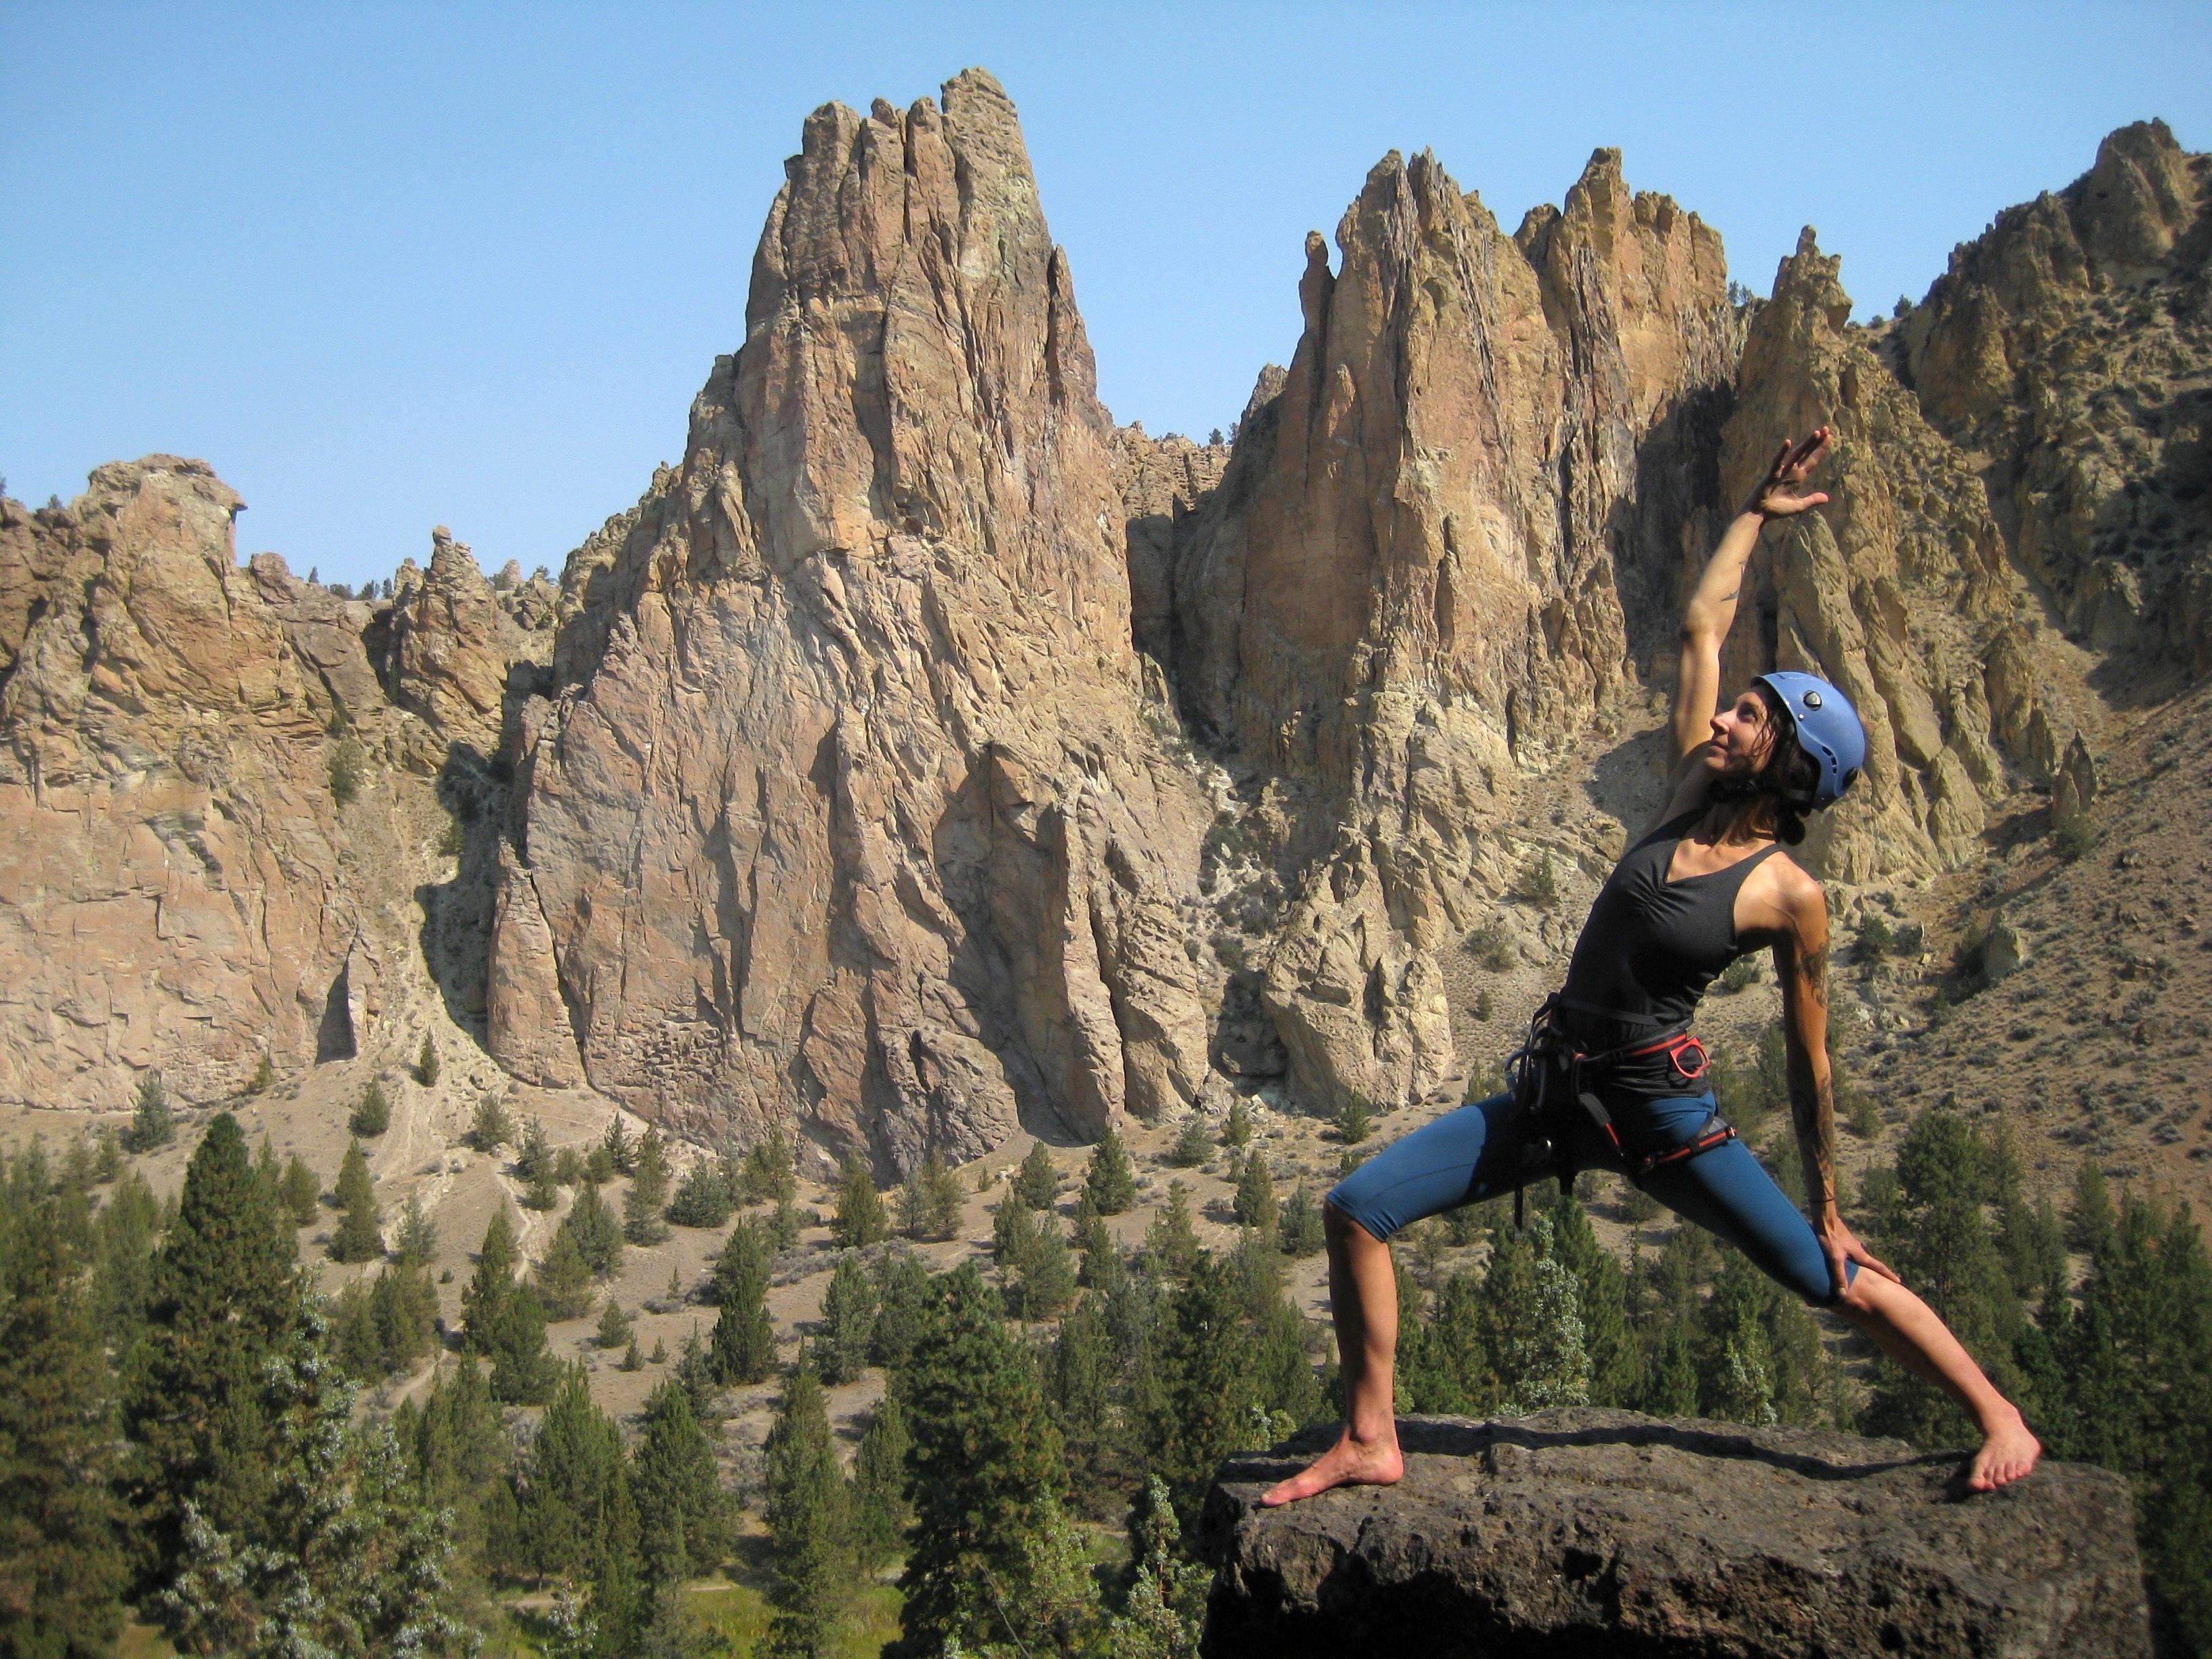 Alix Northup Yoga Rock Climbing